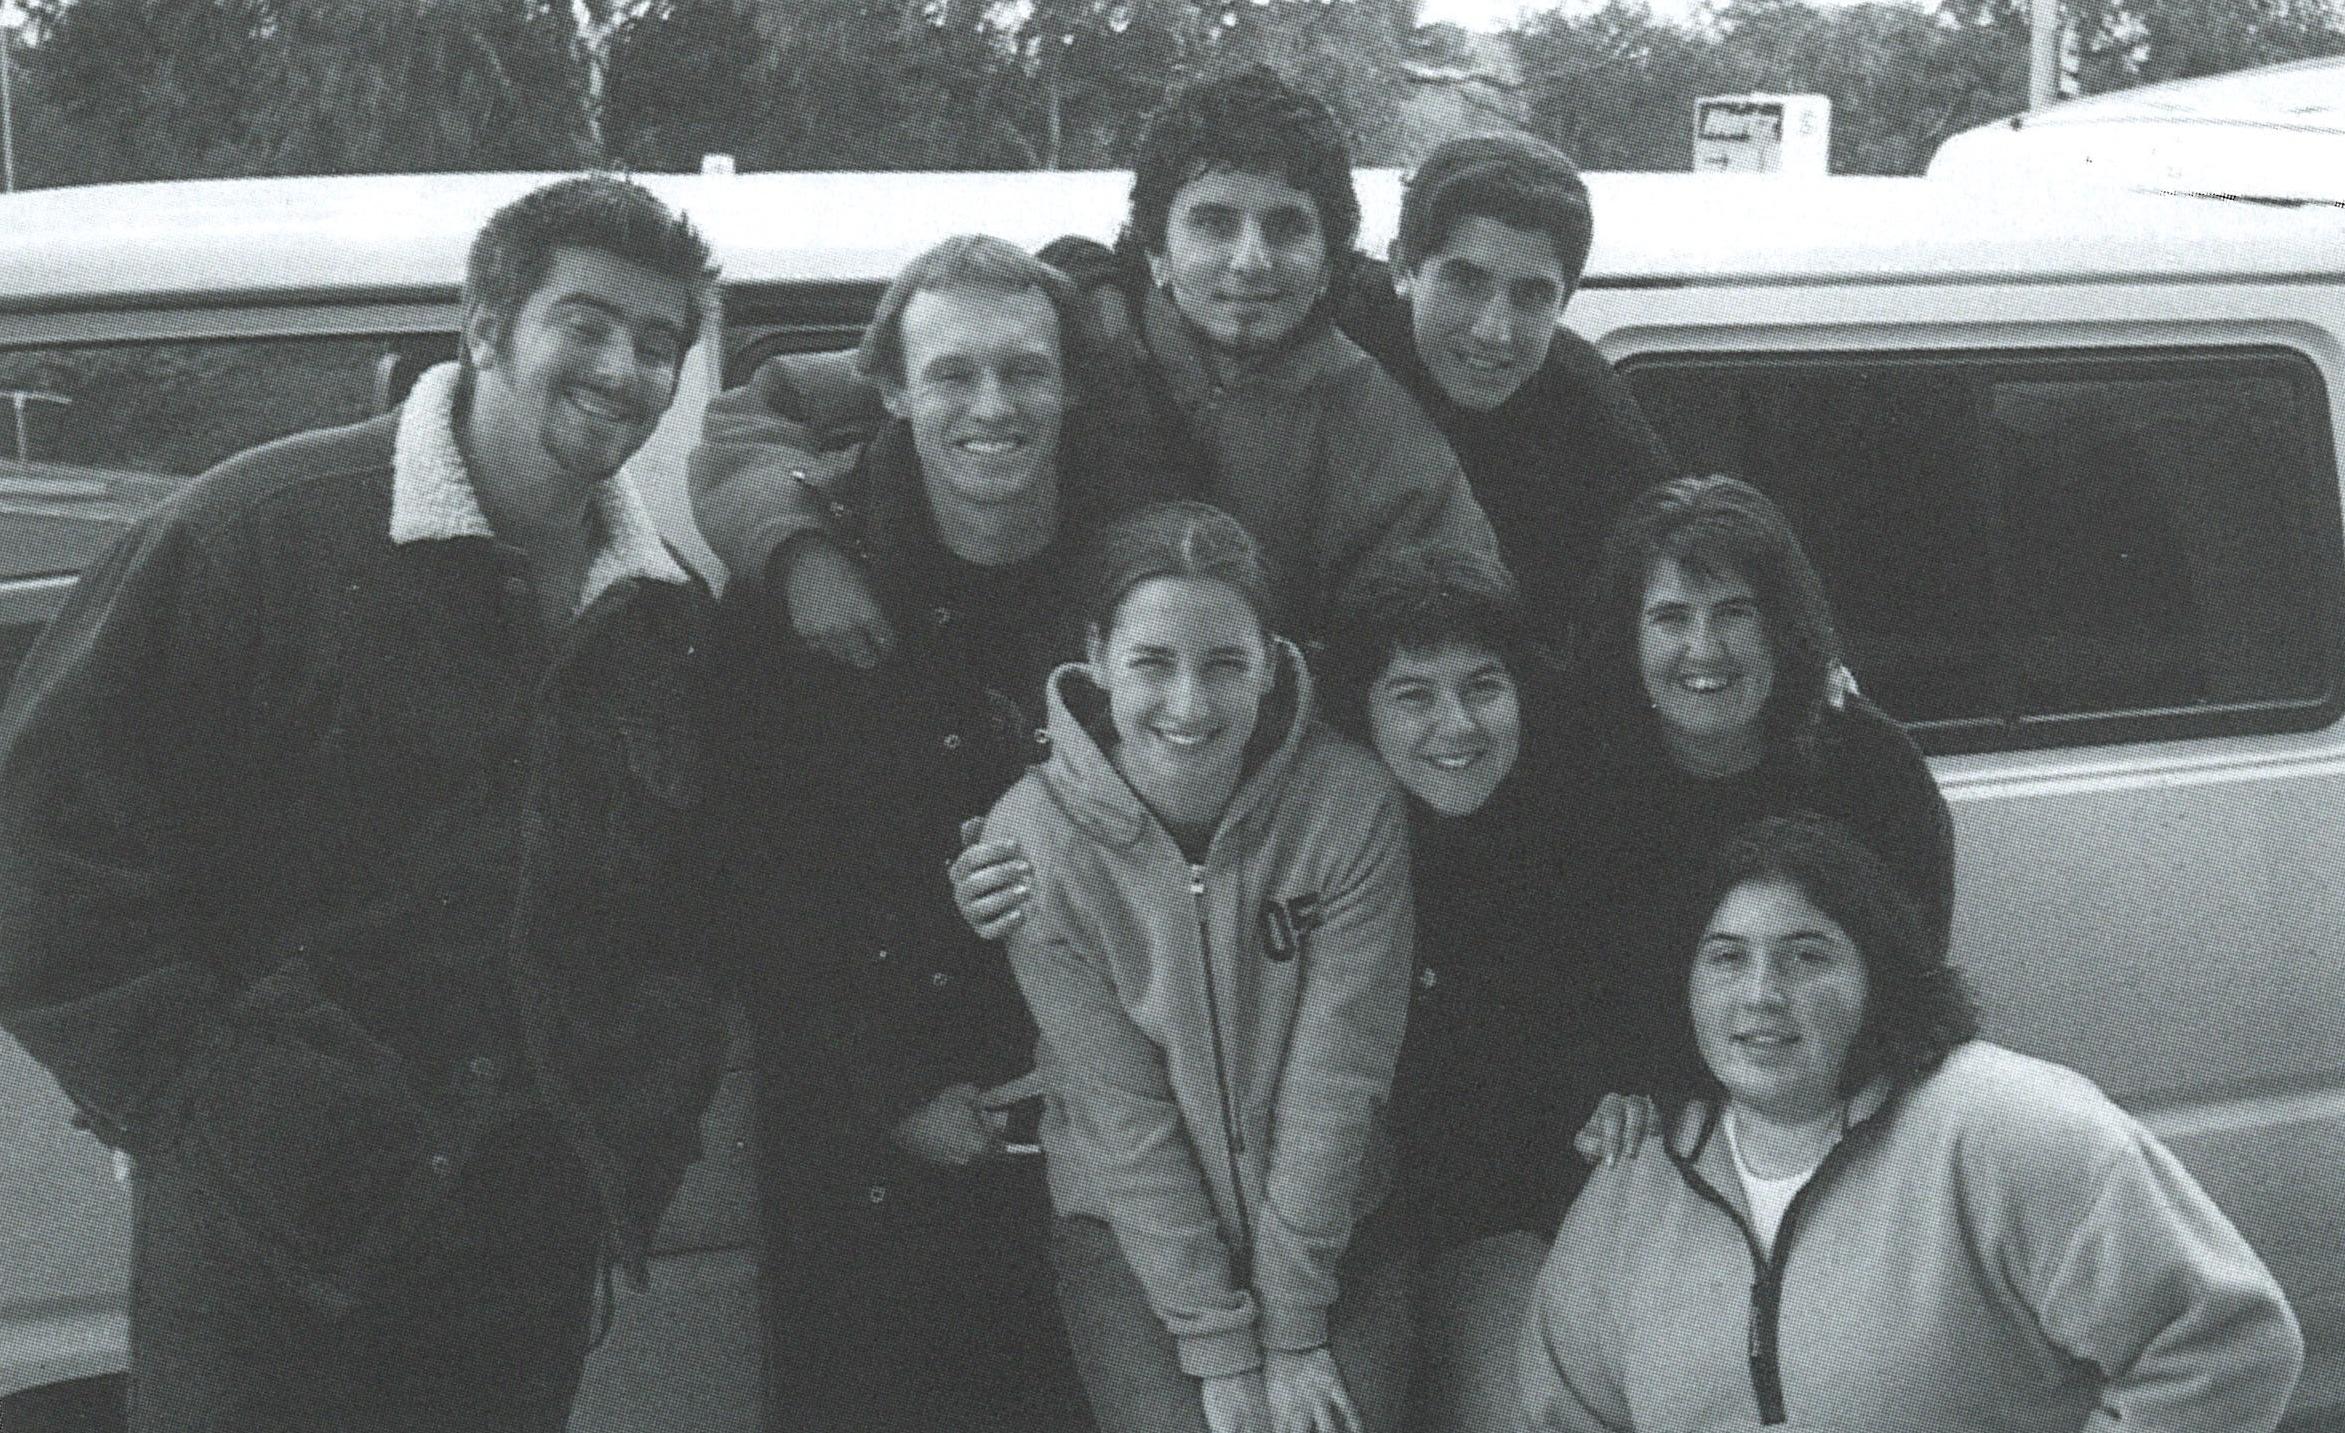 Back Row: Steve McKinley, Blair McWhinney, Carlo Denitto, Angelo (Harry) Benedetto Middle Row: Lidia Galea nee Seselja, Monica Smokrovic nee Romagnolli, Eilish O'Reilly (RIP) Front Row: Lucia McFarlane